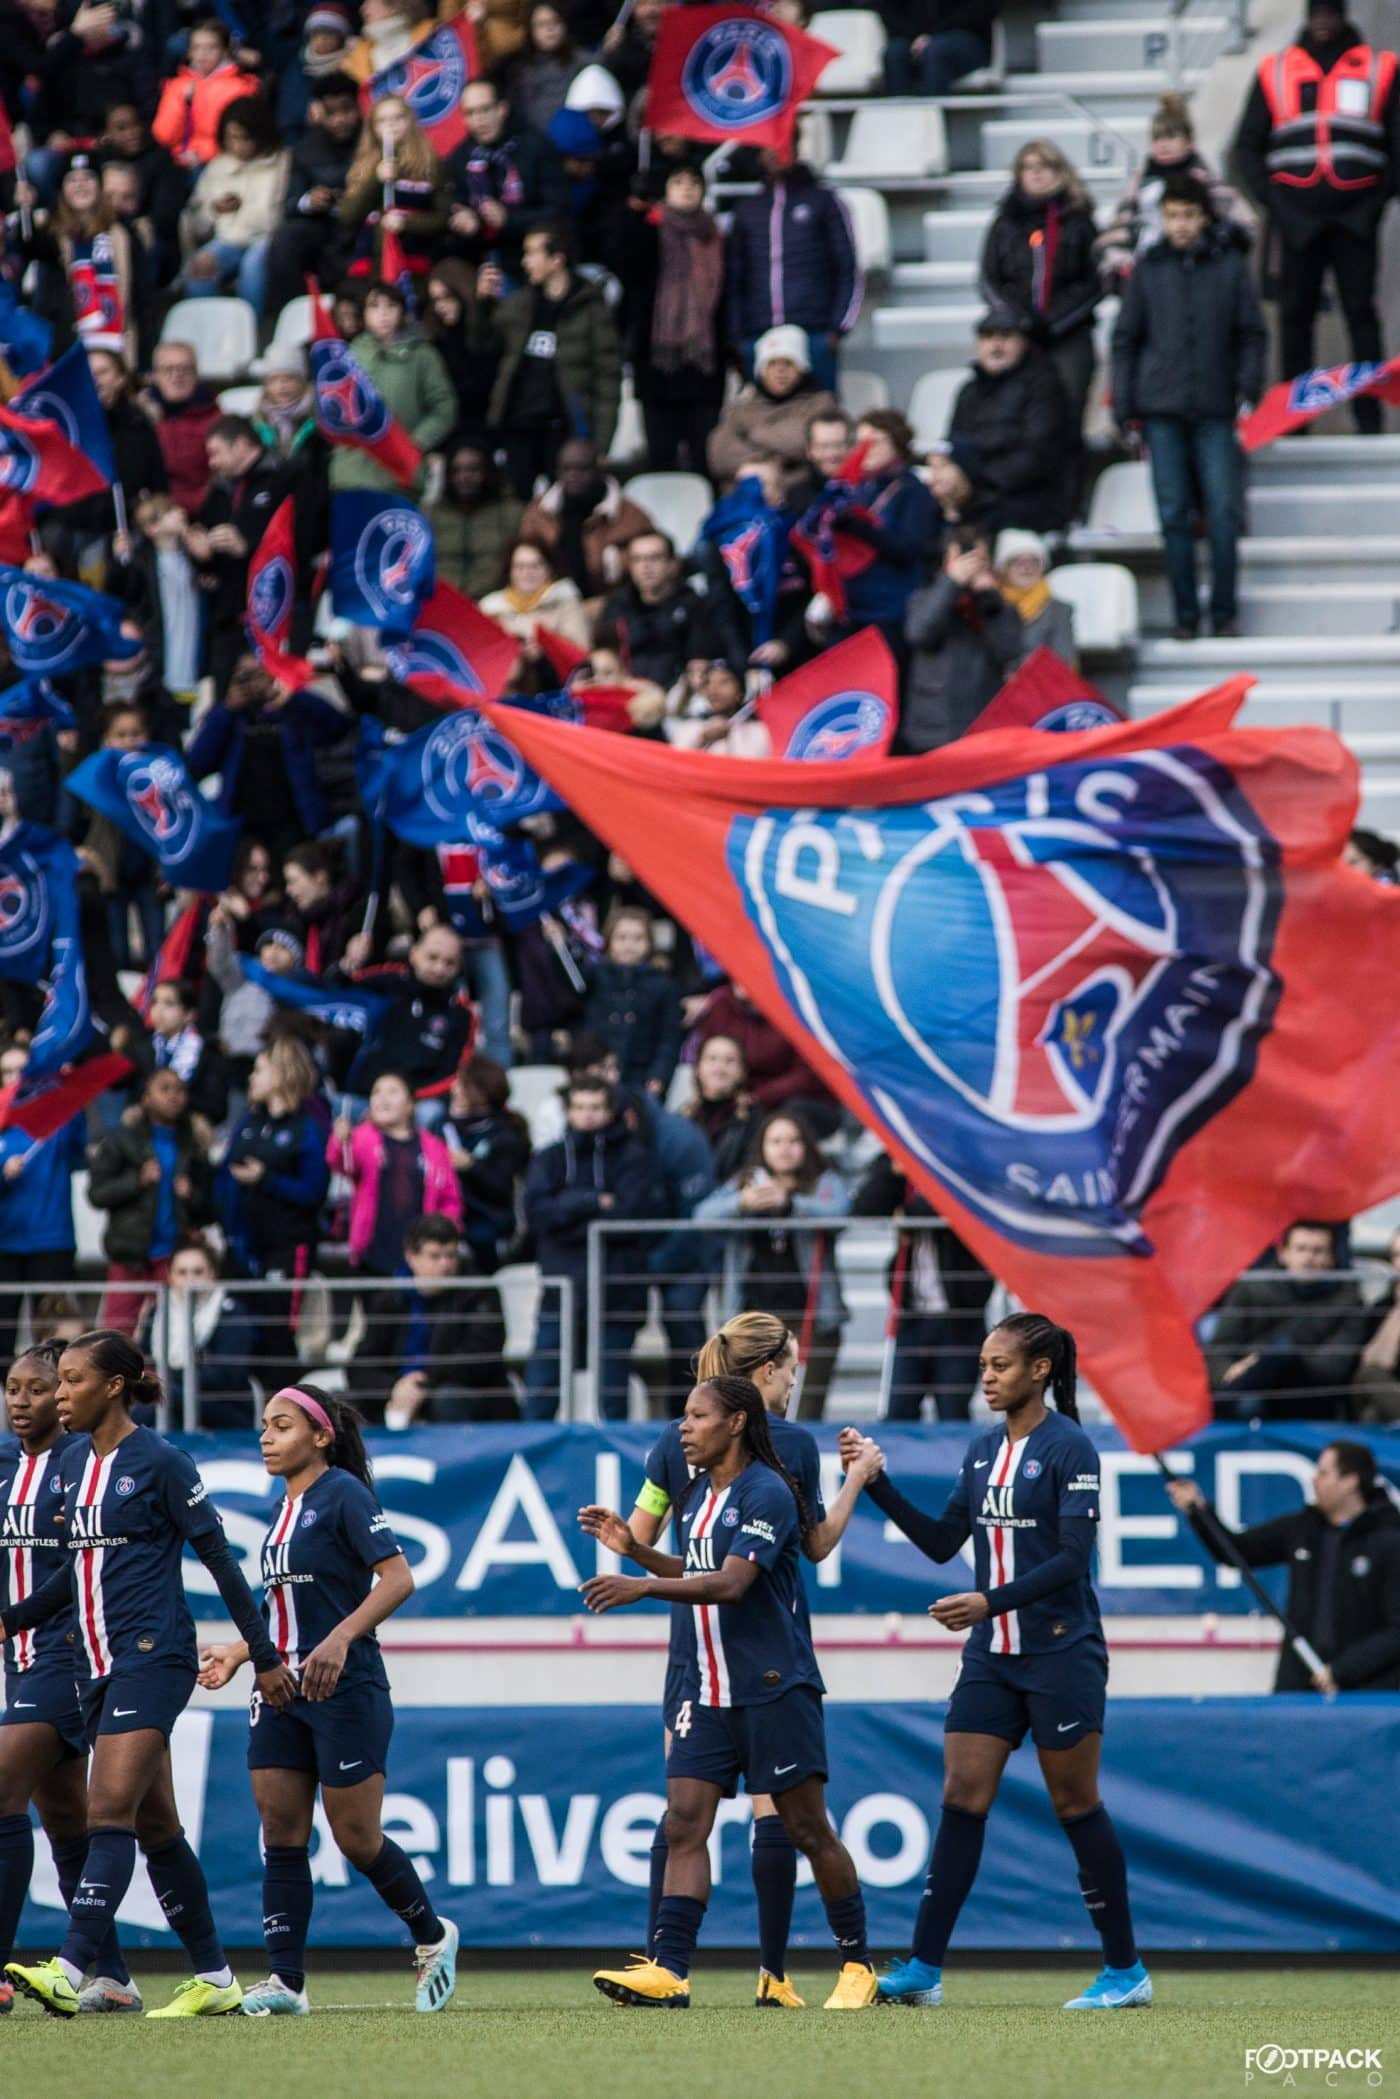 au-stade-paris-saint-germain-psg-olympique-de-marseille-d1-feminine-arkema-footpack-18